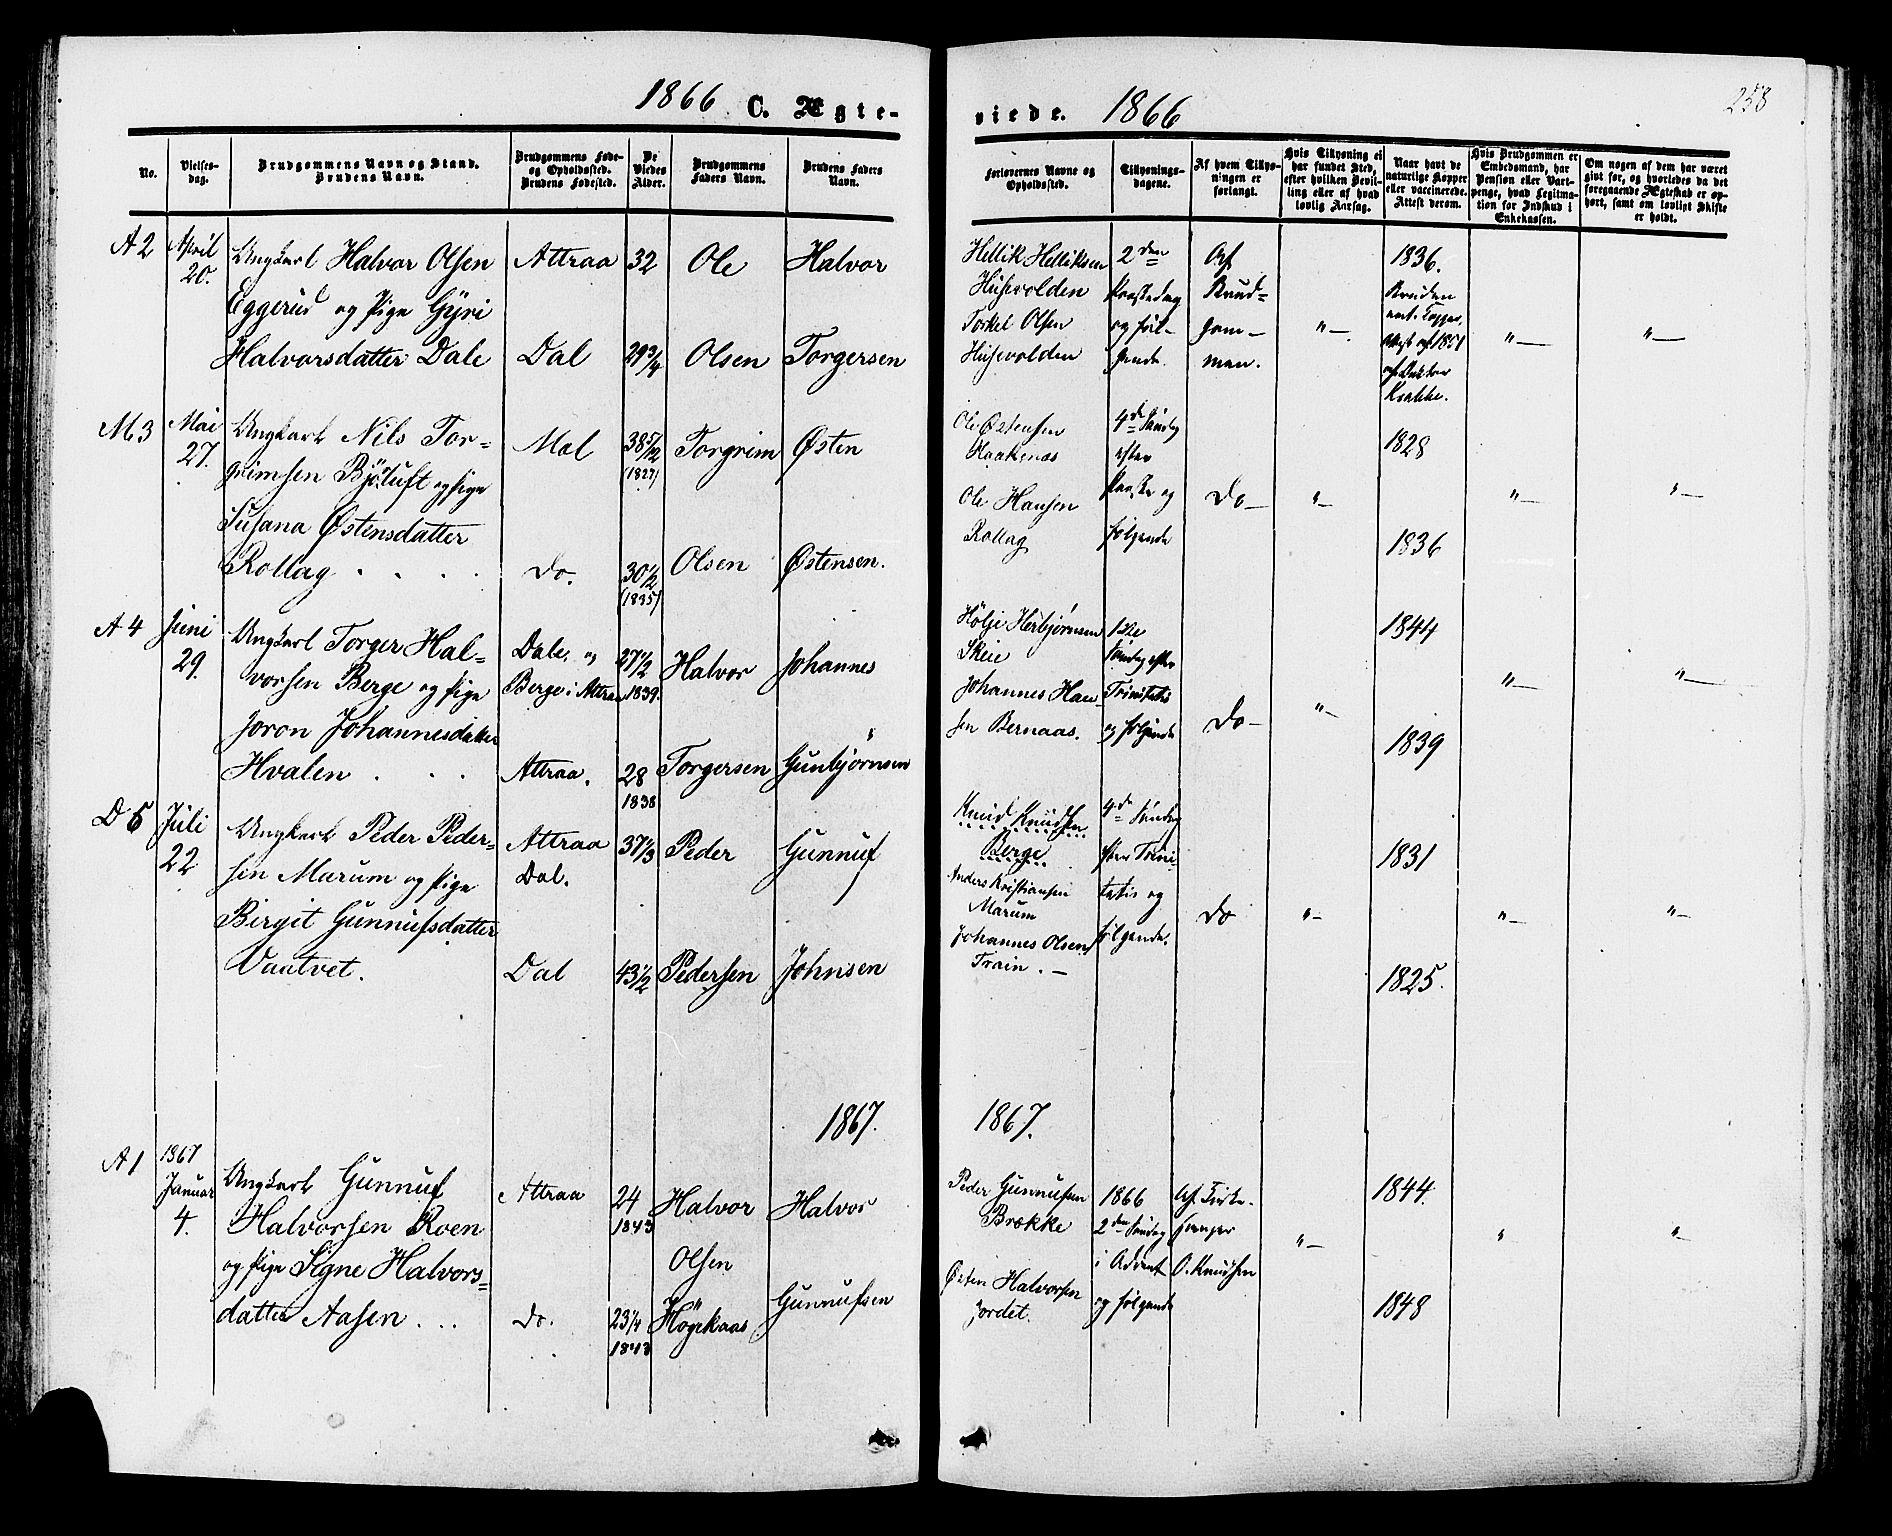 SAKO, Tinn kirkebøker, F/Fa/L0006: Ministerialbok nr. I 6, 1857-1878, s. 258